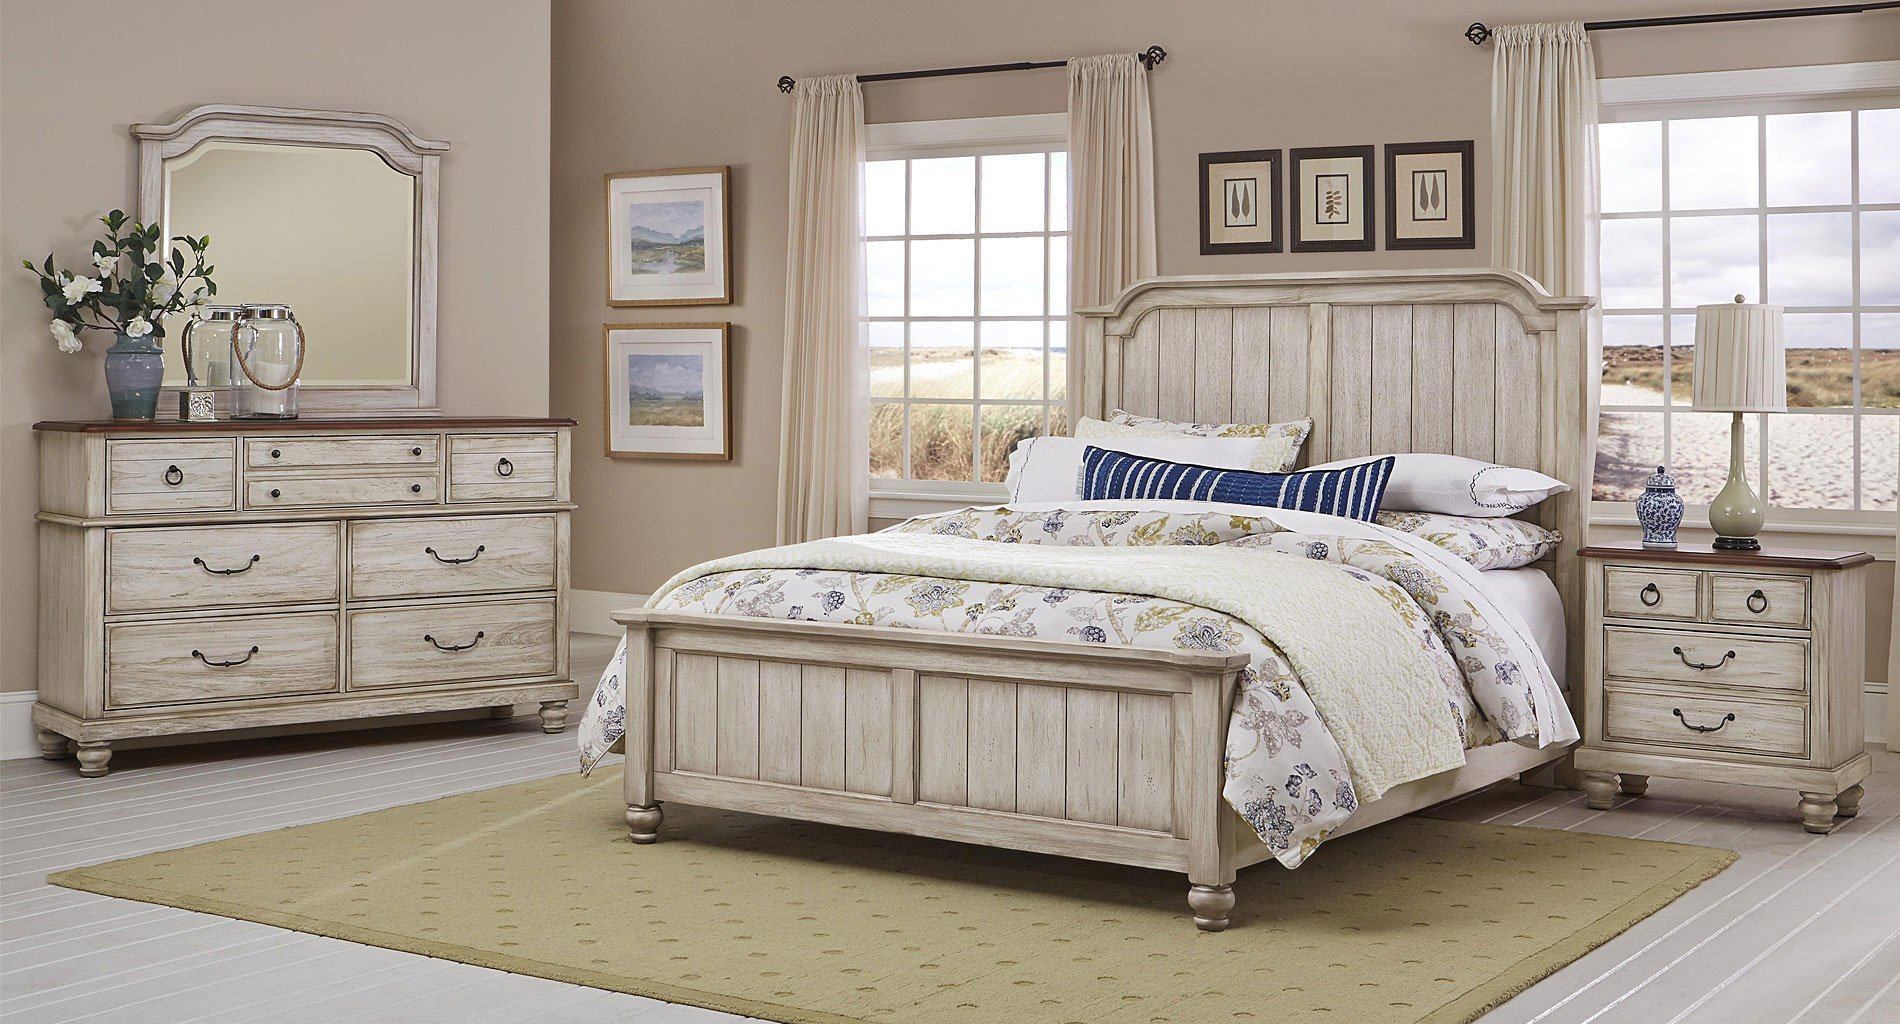 3 Piece Bedroom Furniture Set Inspirational Distressed F White Bedroom Furniture